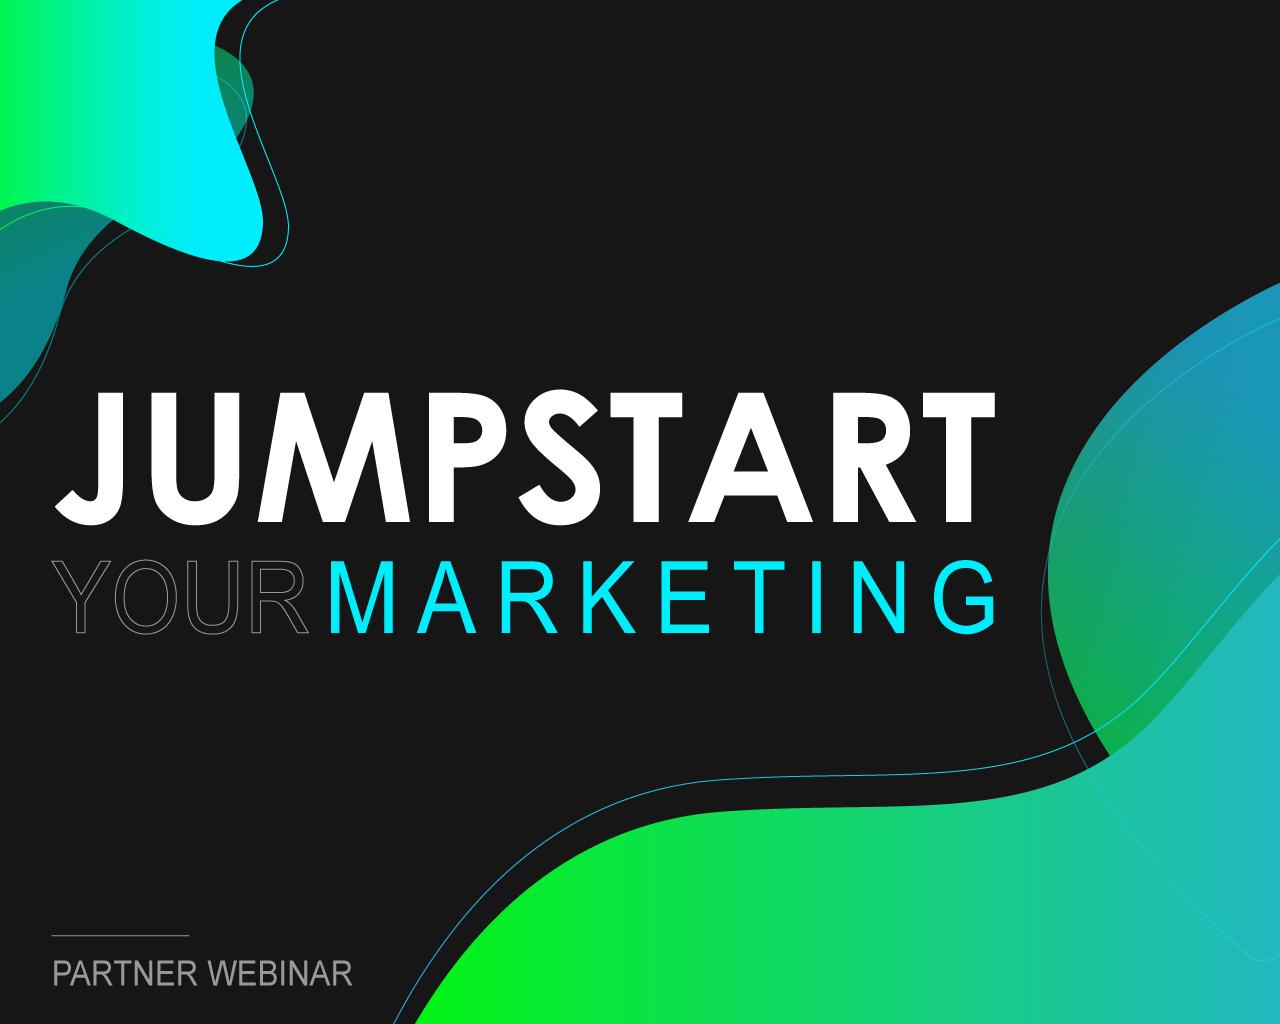 Jumpstart your Marketing